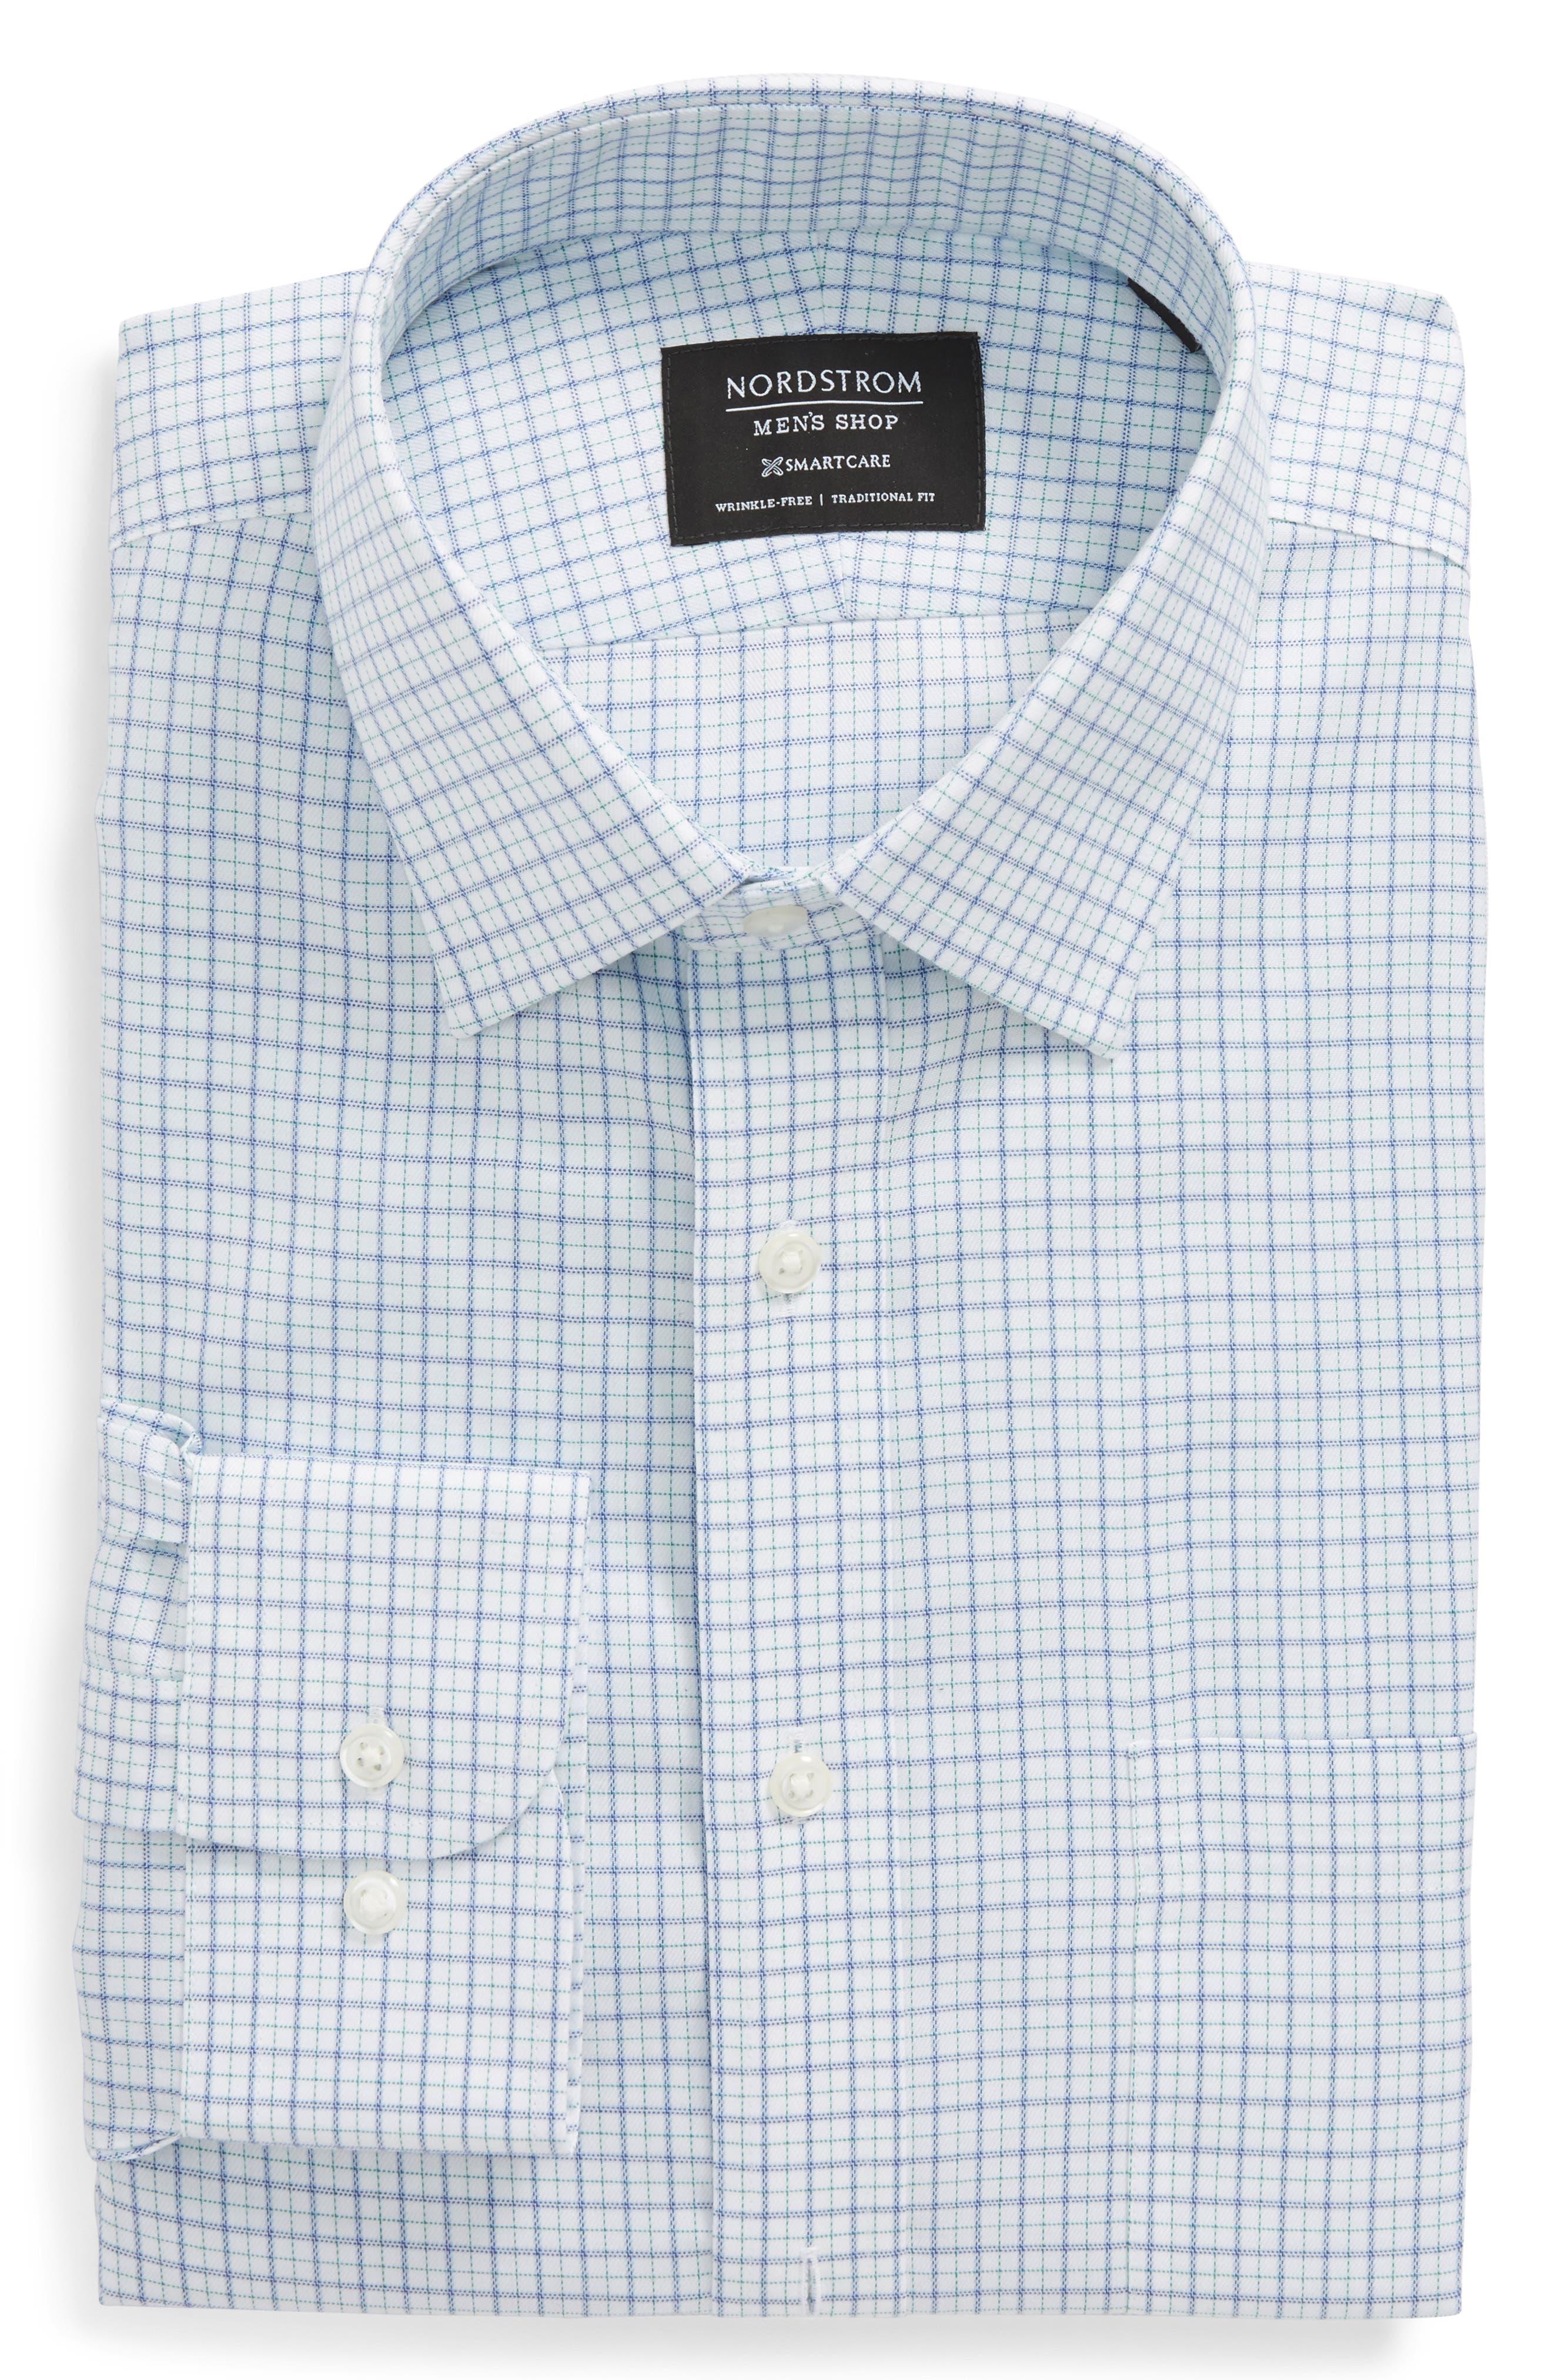 Nordstrom Men's Shop Smartcare™ Traditional Fit Check Dress Shirt